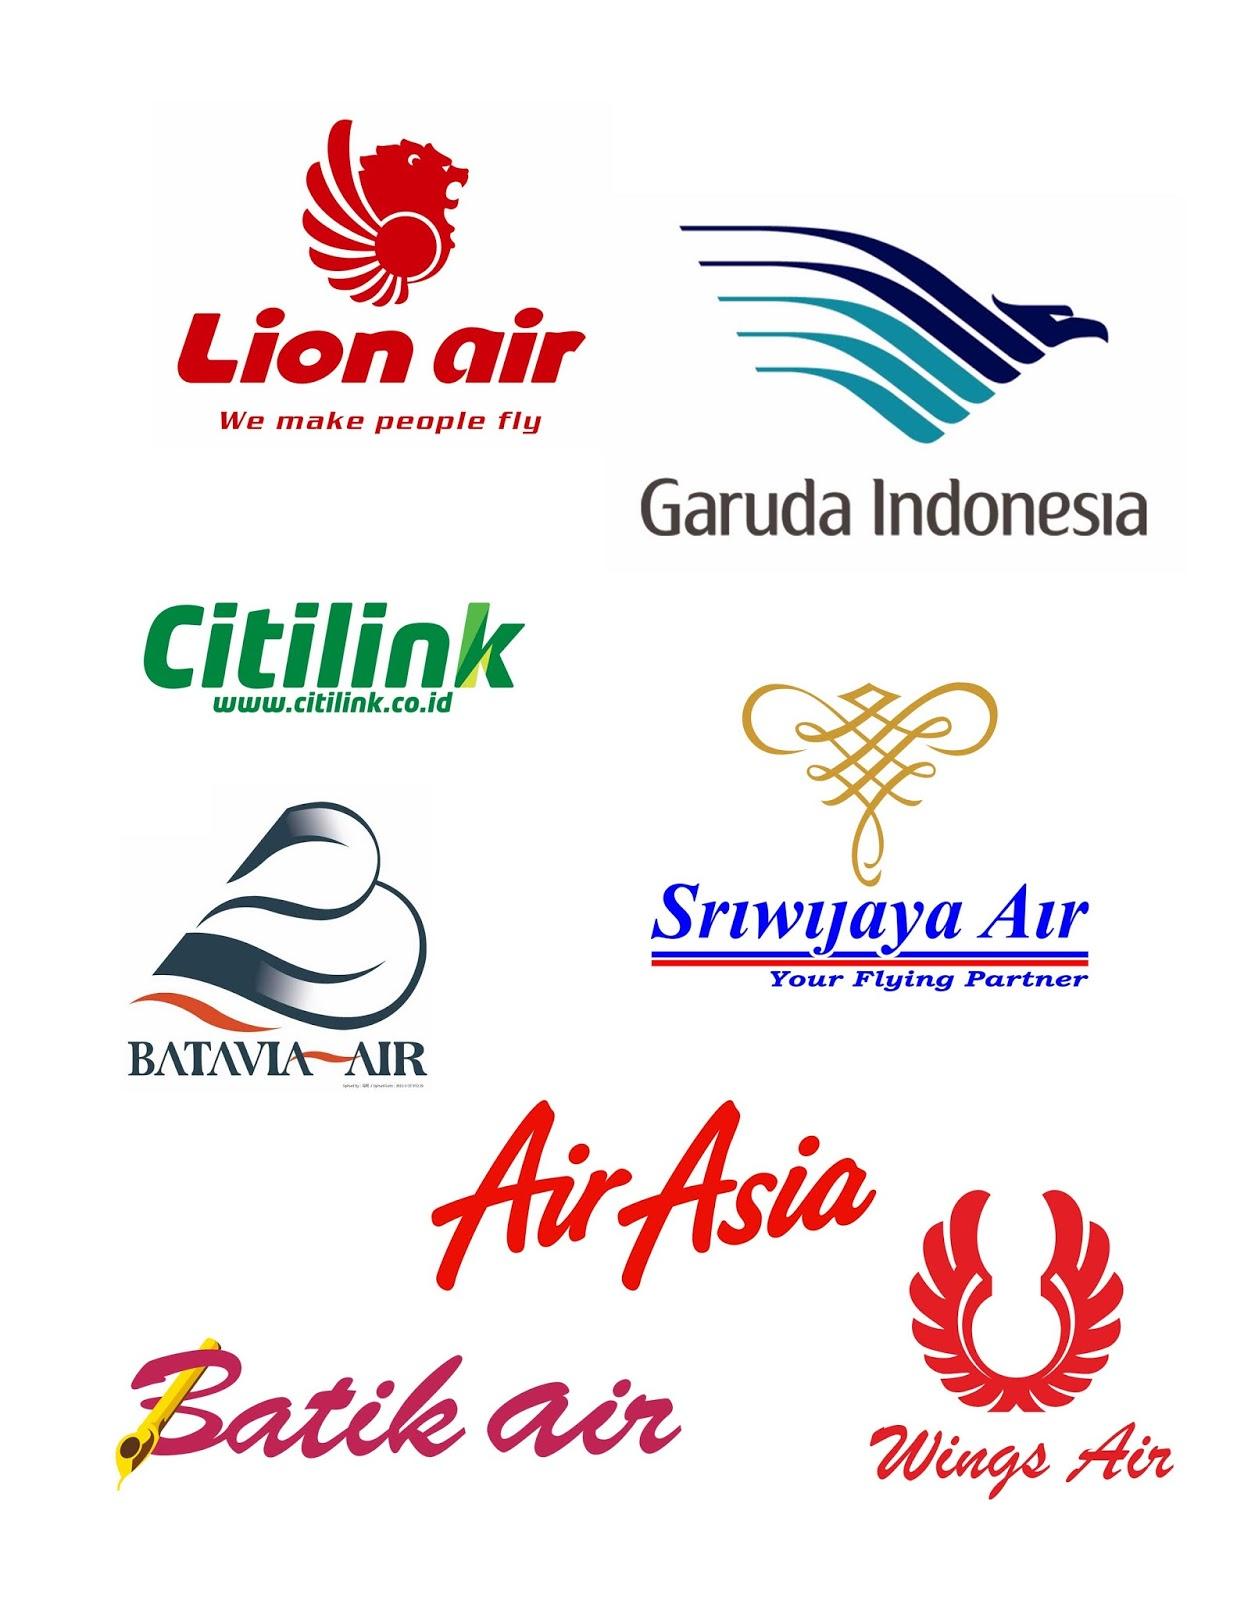 Promo Tiket Traveloka Promotiketcoid Riris888travel Agen Air Asia Pesawat